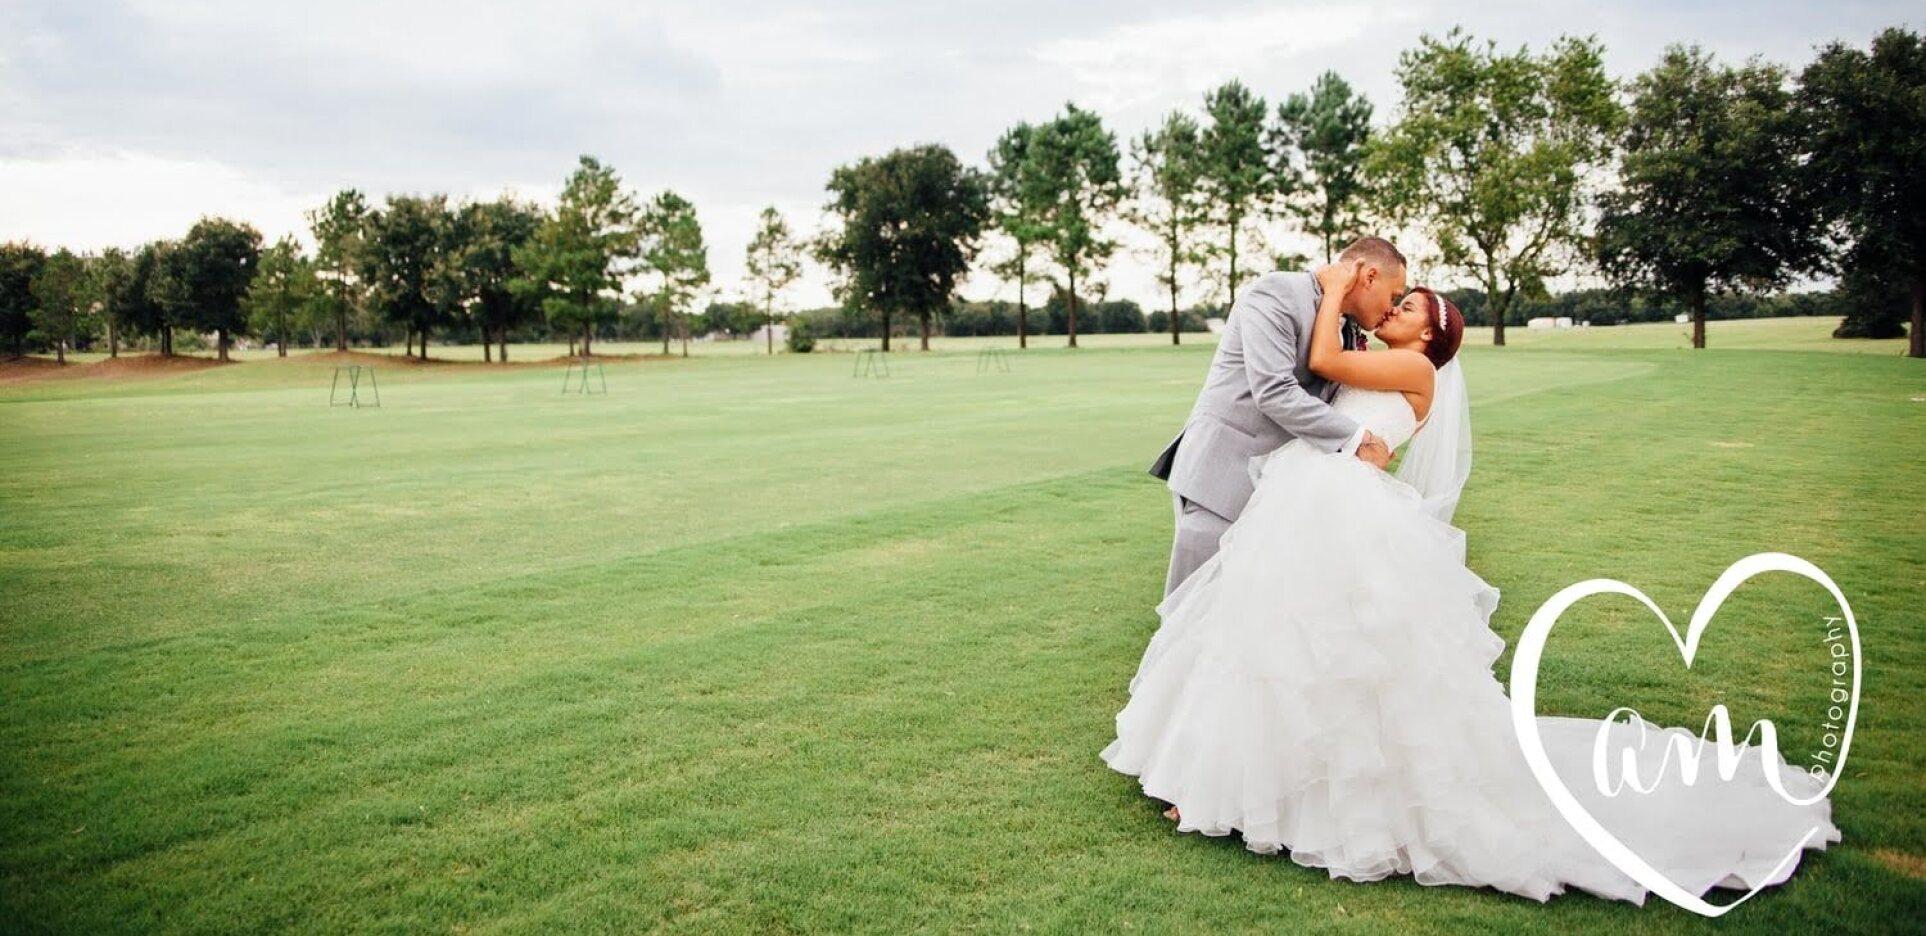 bride and groom during wedding at Arlington Ridge Golf Club